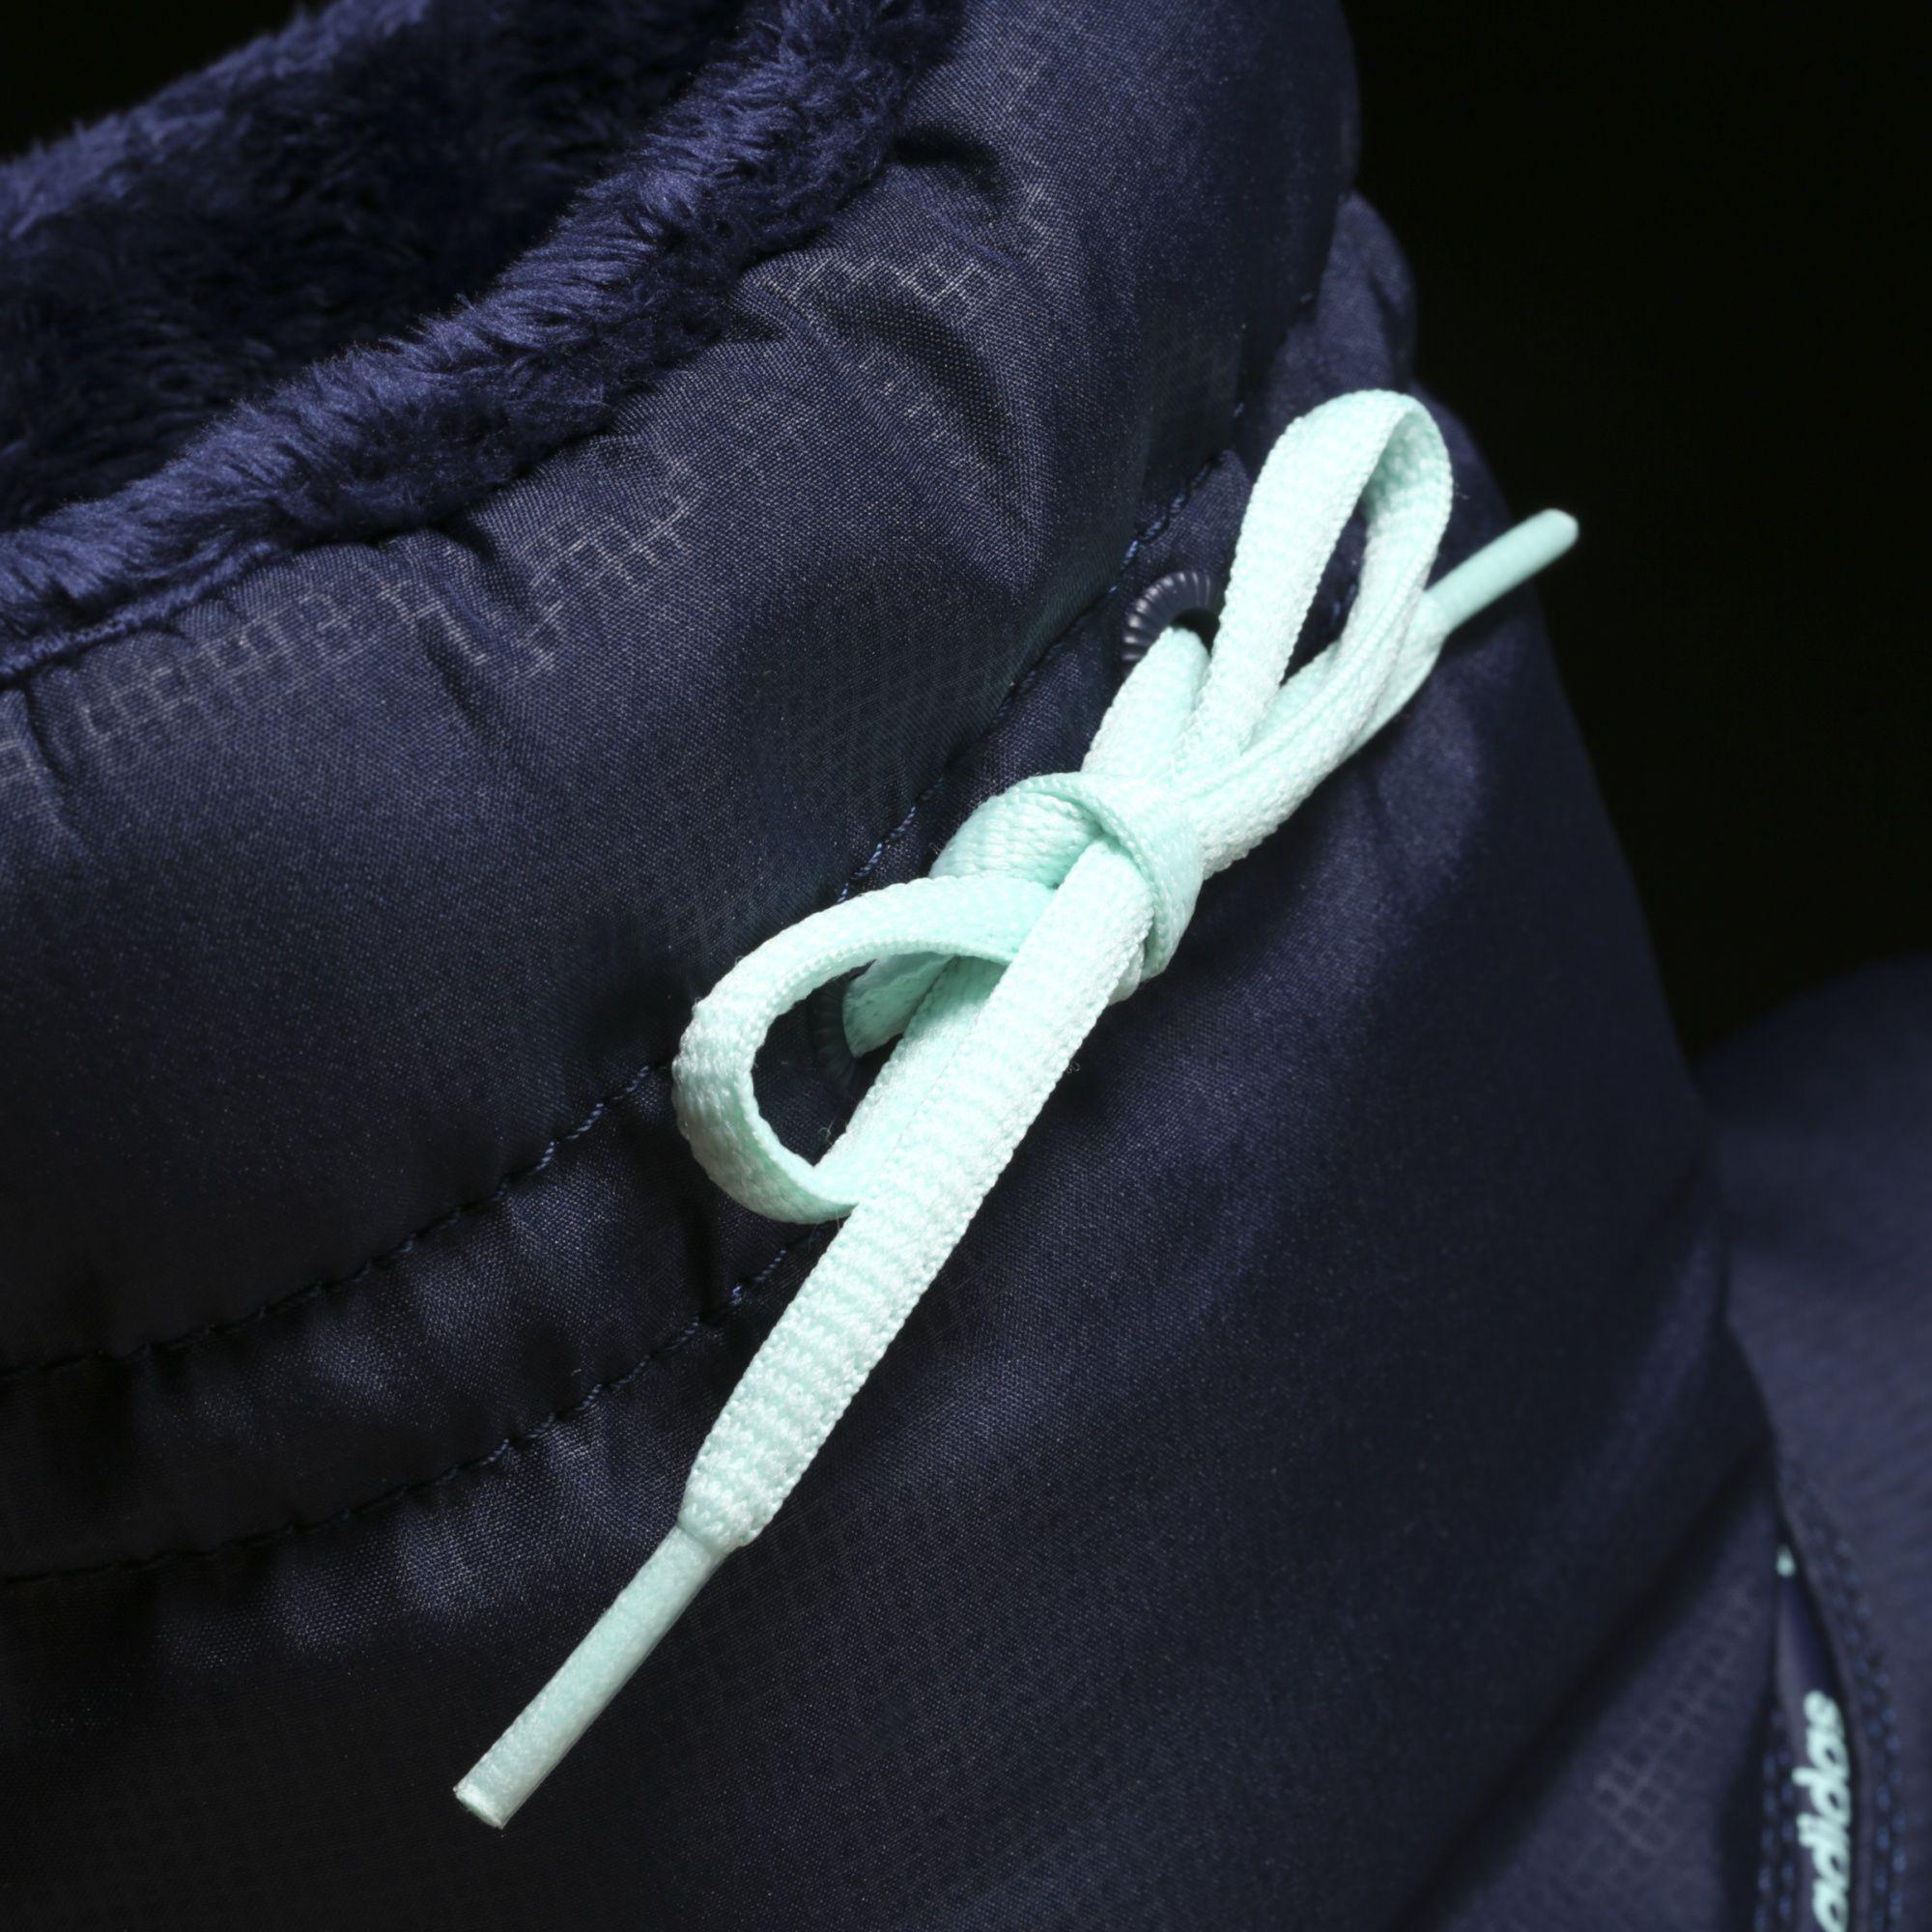 Зимние сапоги Warm comfort W AW4292 adidas Neo - Украина   ONETEAM ... 84b0abf90f8